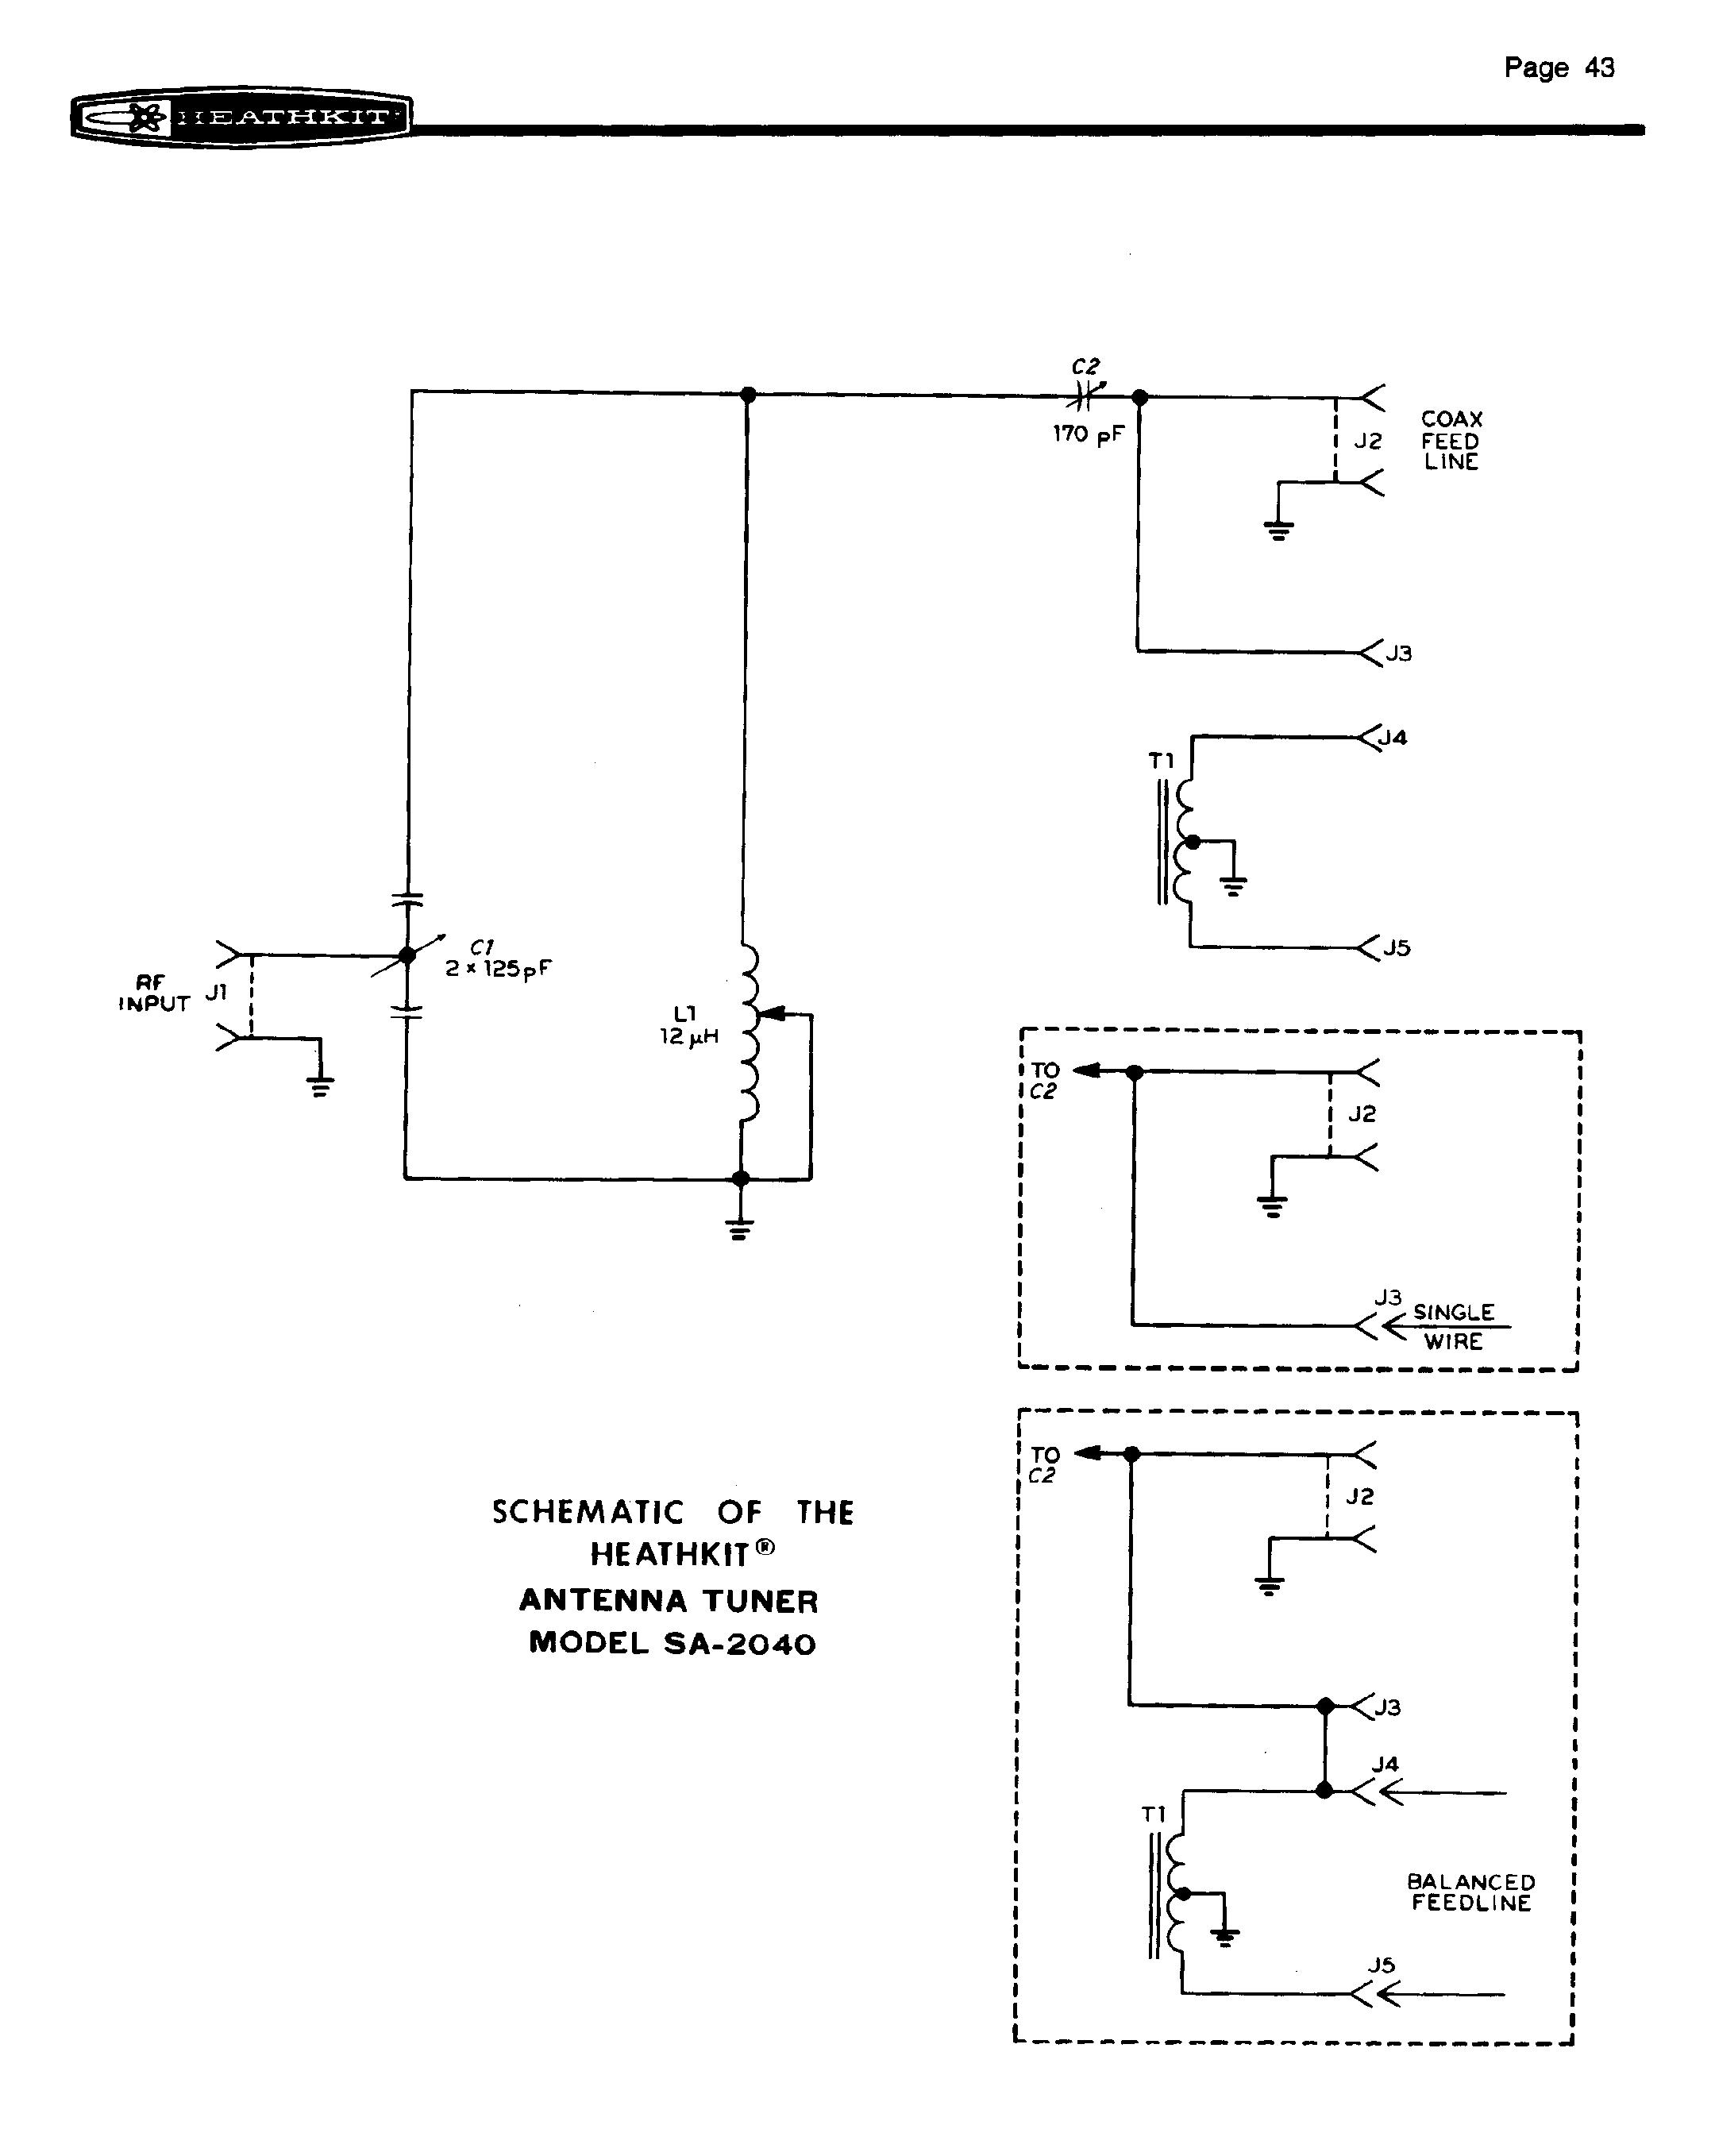 Heathkit sa-2040 2kw antenna tuner with manual   ebay.